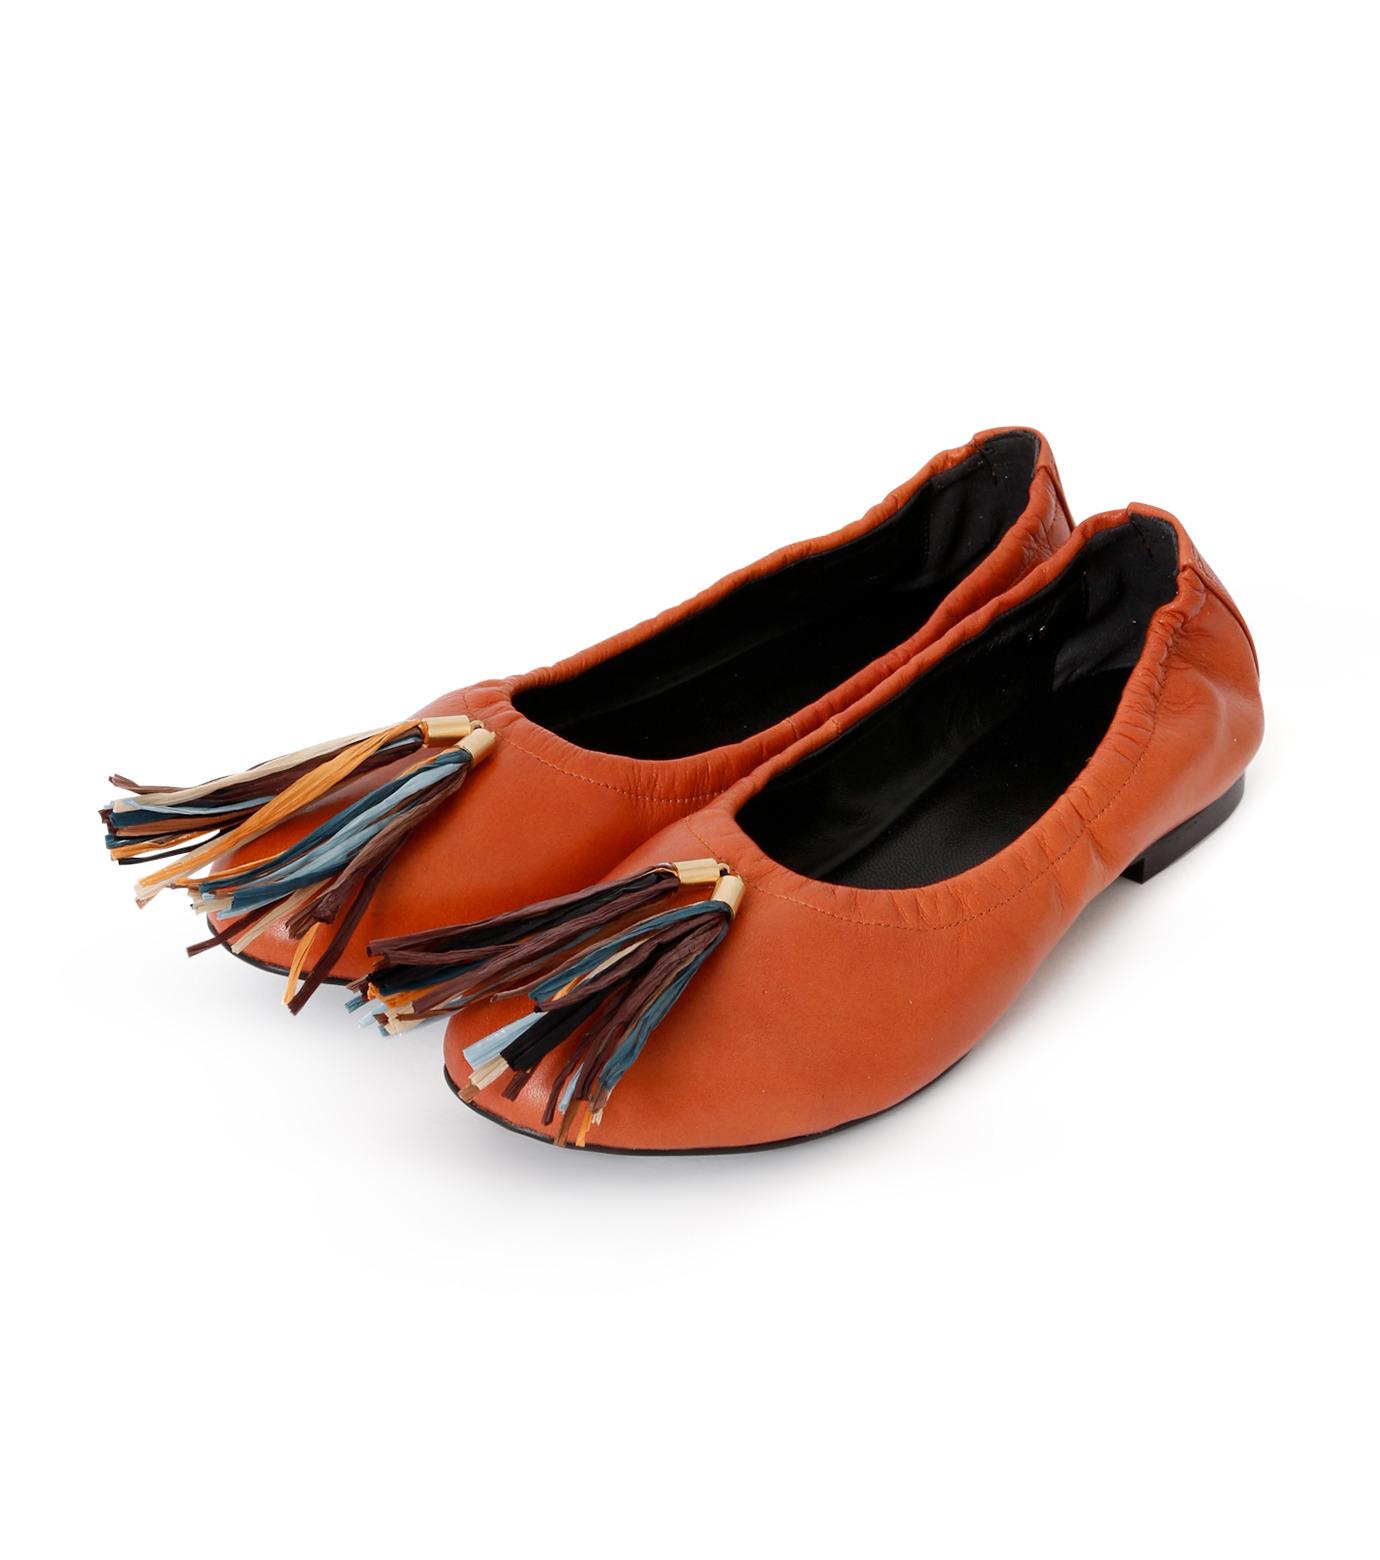 PIPPICHIC(ピッピシック)のballet shoes-DARK BROWN(シューズ/shoes)-PP16BALLET19-43 拡大詳細画像2